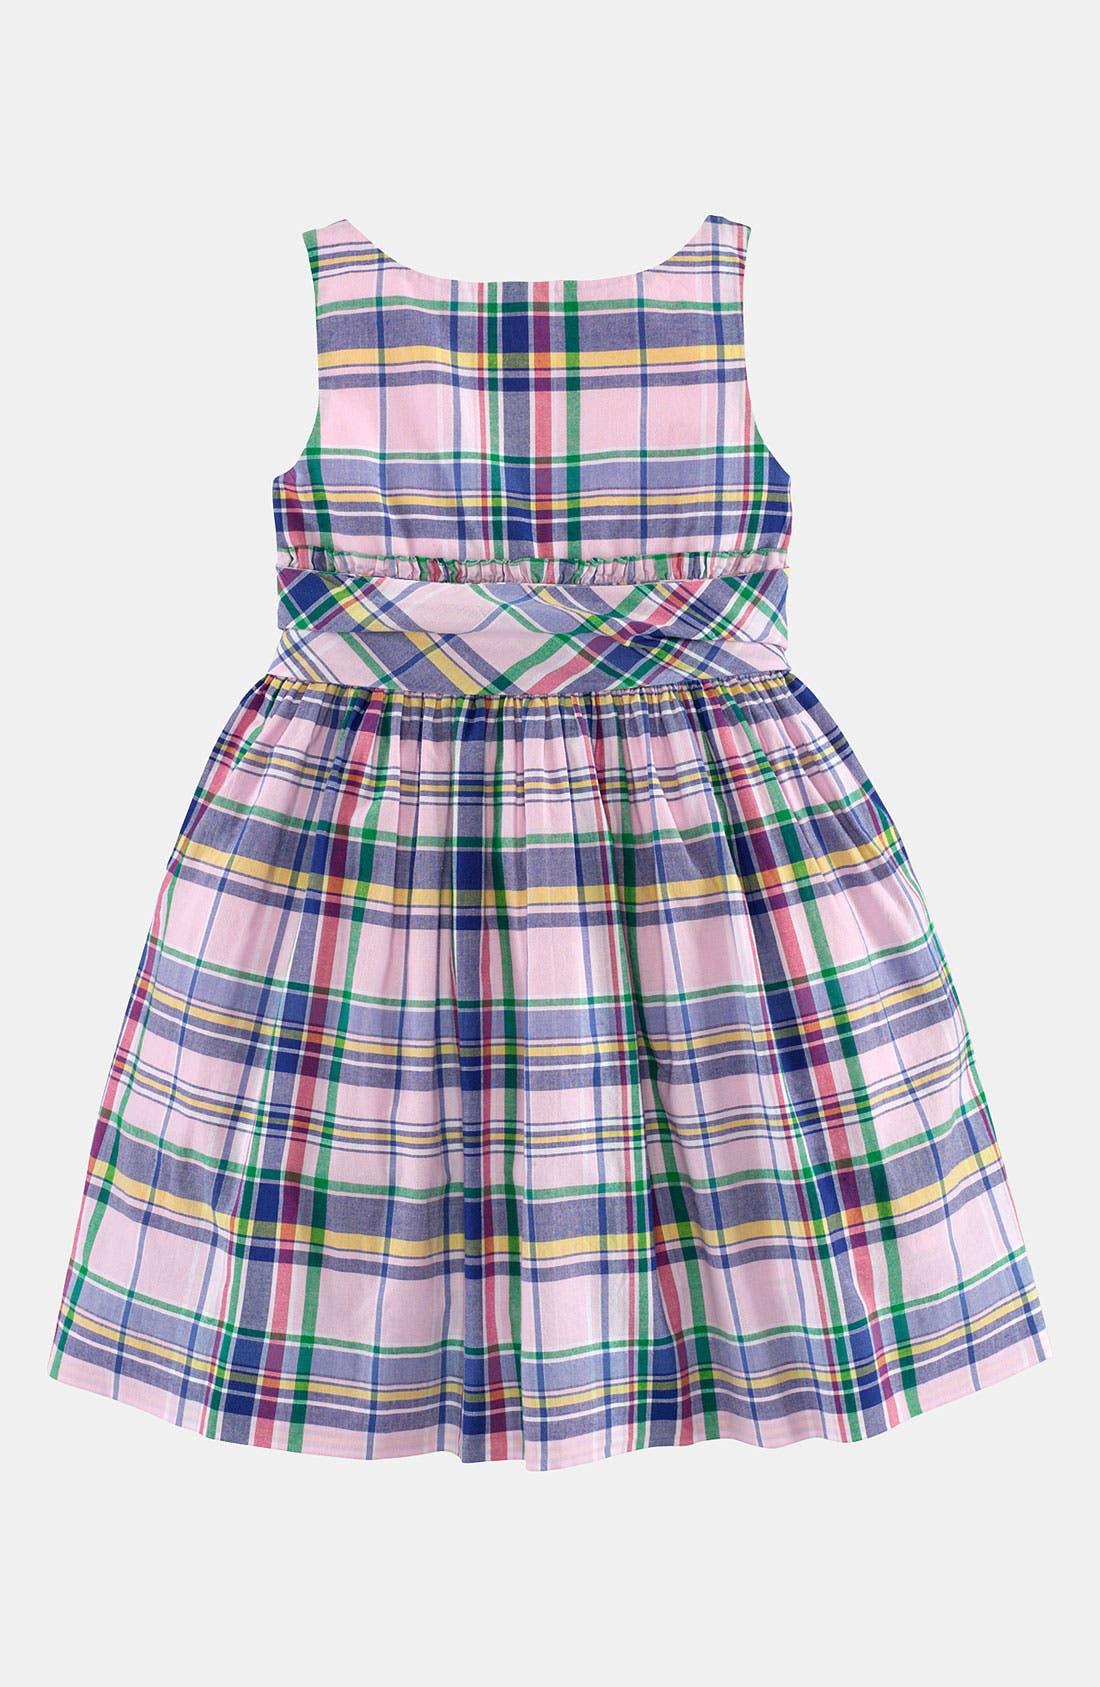 Alternate Image 1 Selected - Ralph Lauren Madras Dress (Toddler)